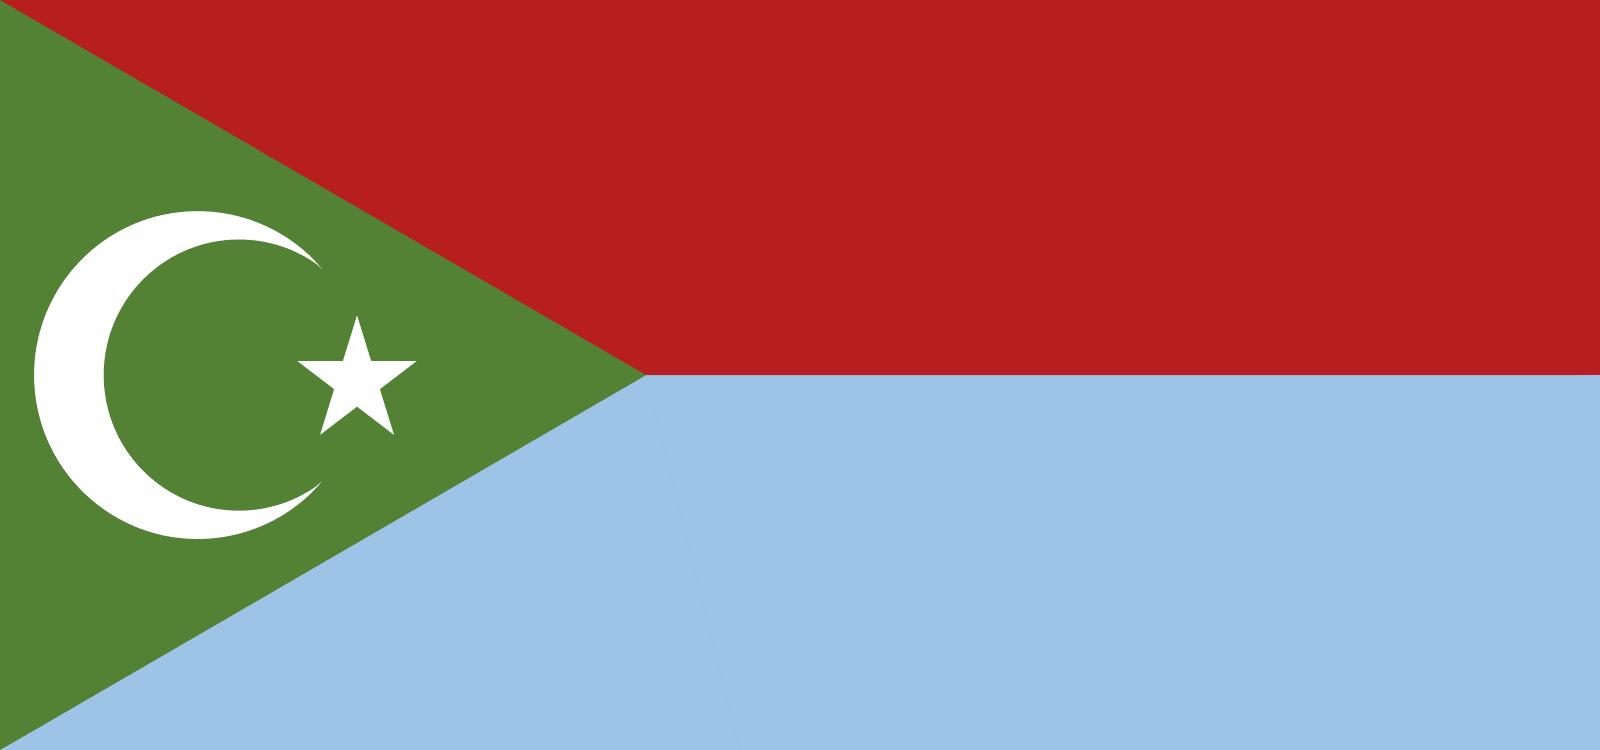 Vlokozu Union invasion of Faricia